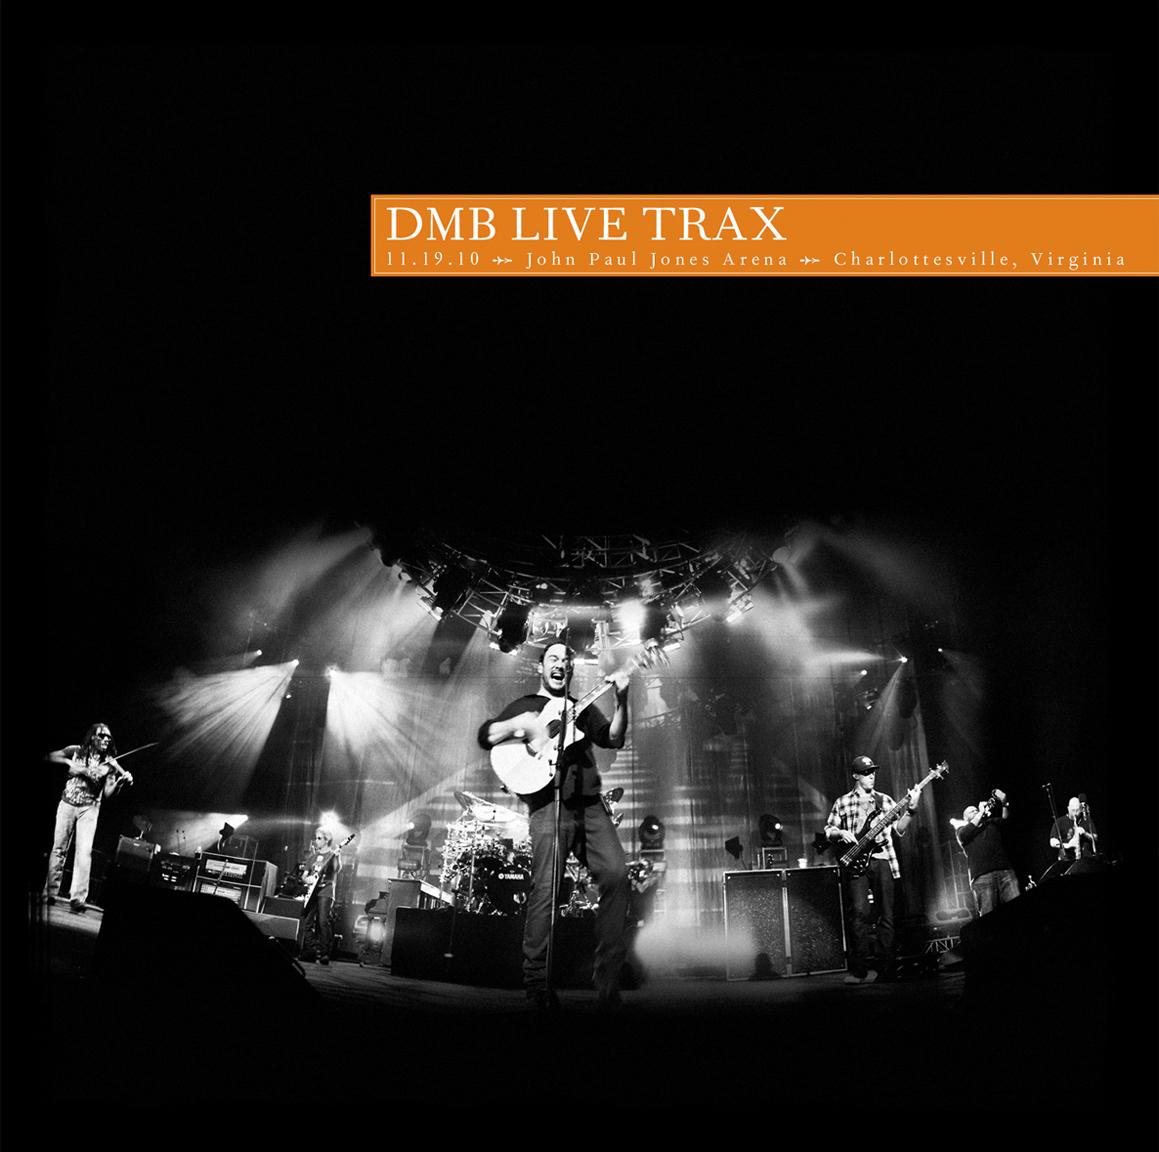 Dave Matthews Band - DMB Live Trax Vol. 28 | …